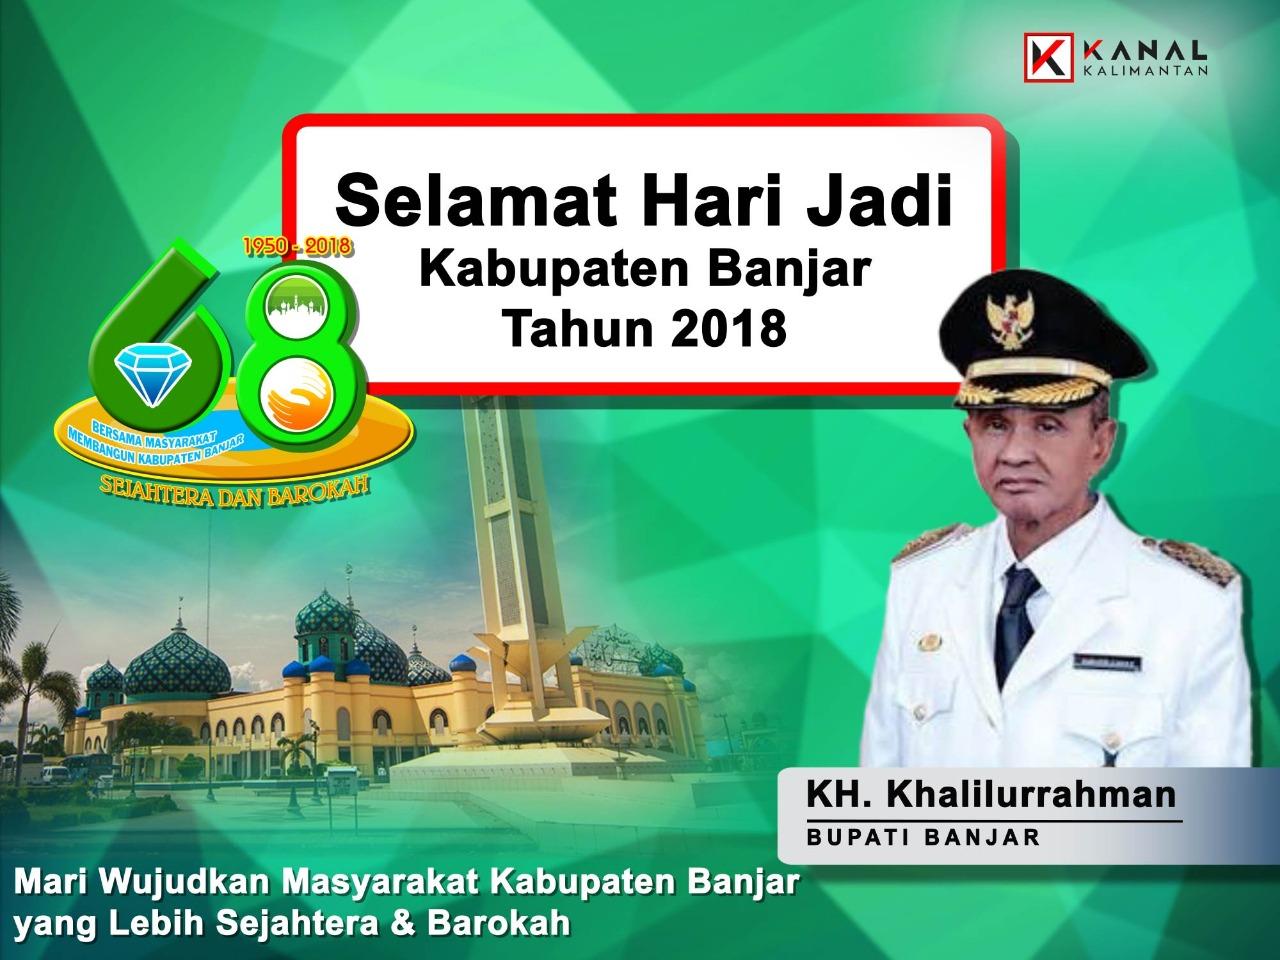 WhatsApp Image 2018-08-14 at 7.50.38 PM